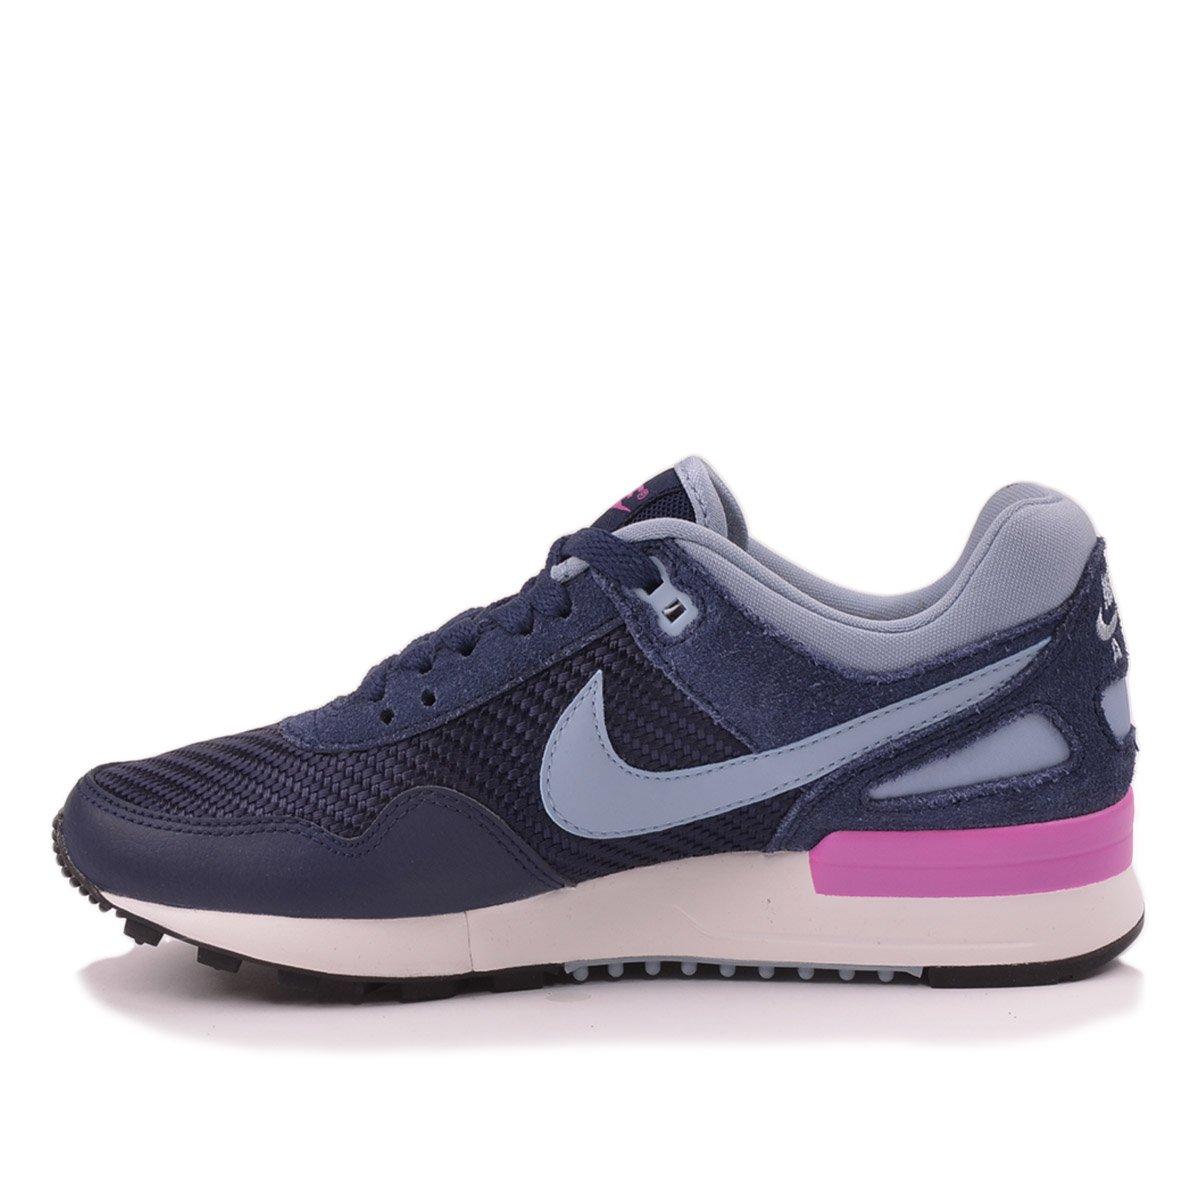 premium selection 317d8 0b1ca Amazon.com   Nike Air Pegasus 89 Women s Running Shoes Size US 6 M Midnight  Navy 844888 402   Shoes